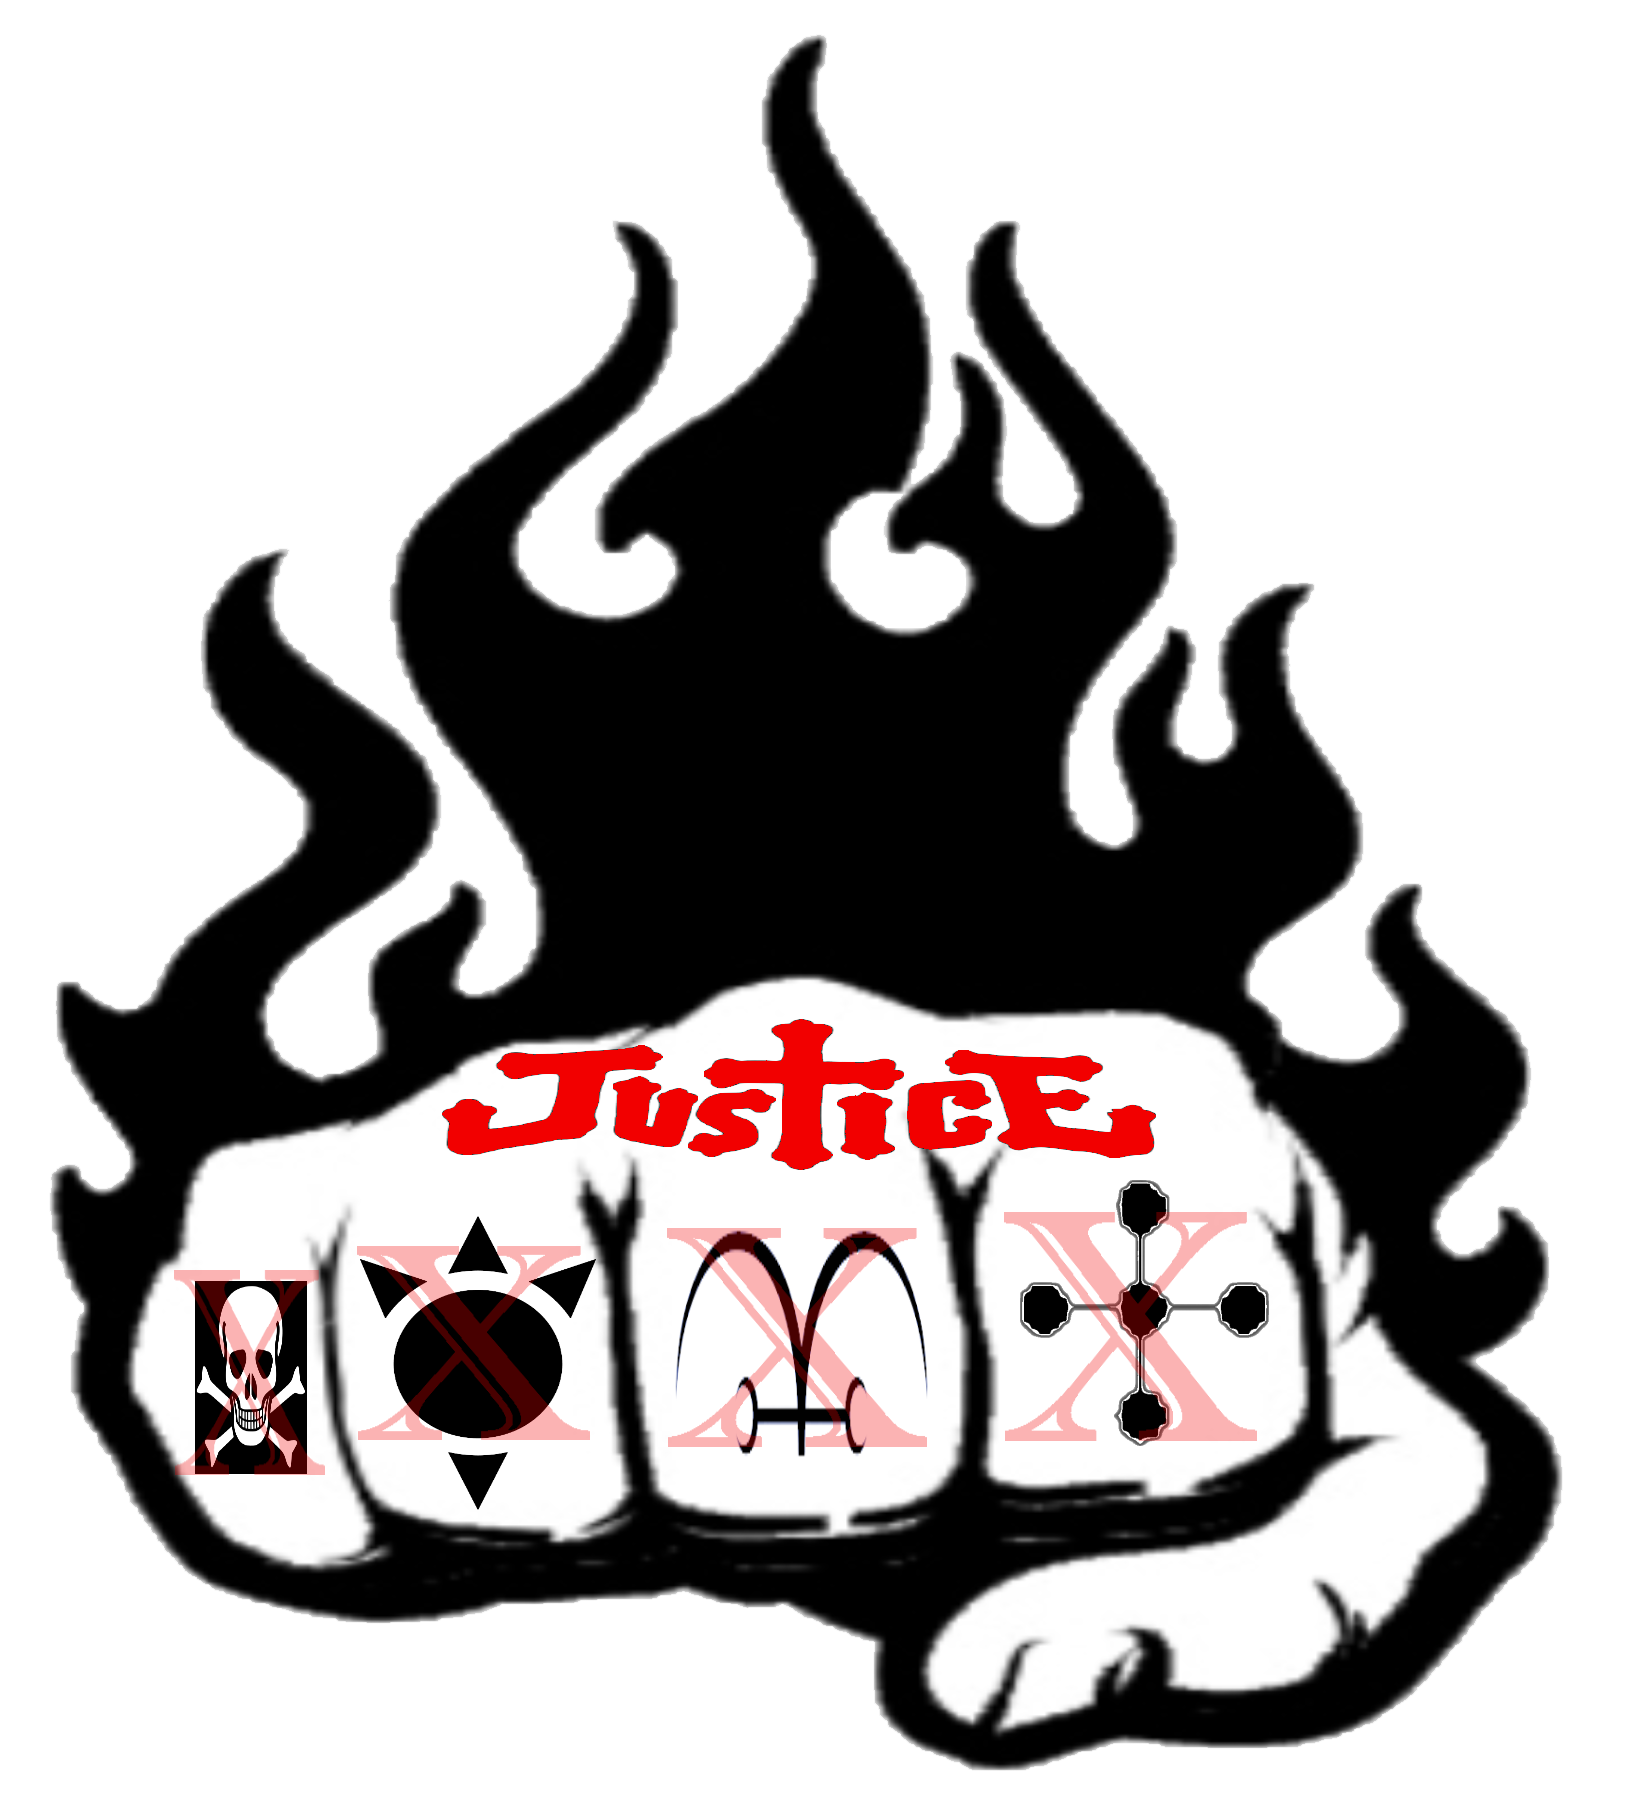 image - the logo | one piece: ship of fools wiki | fandom